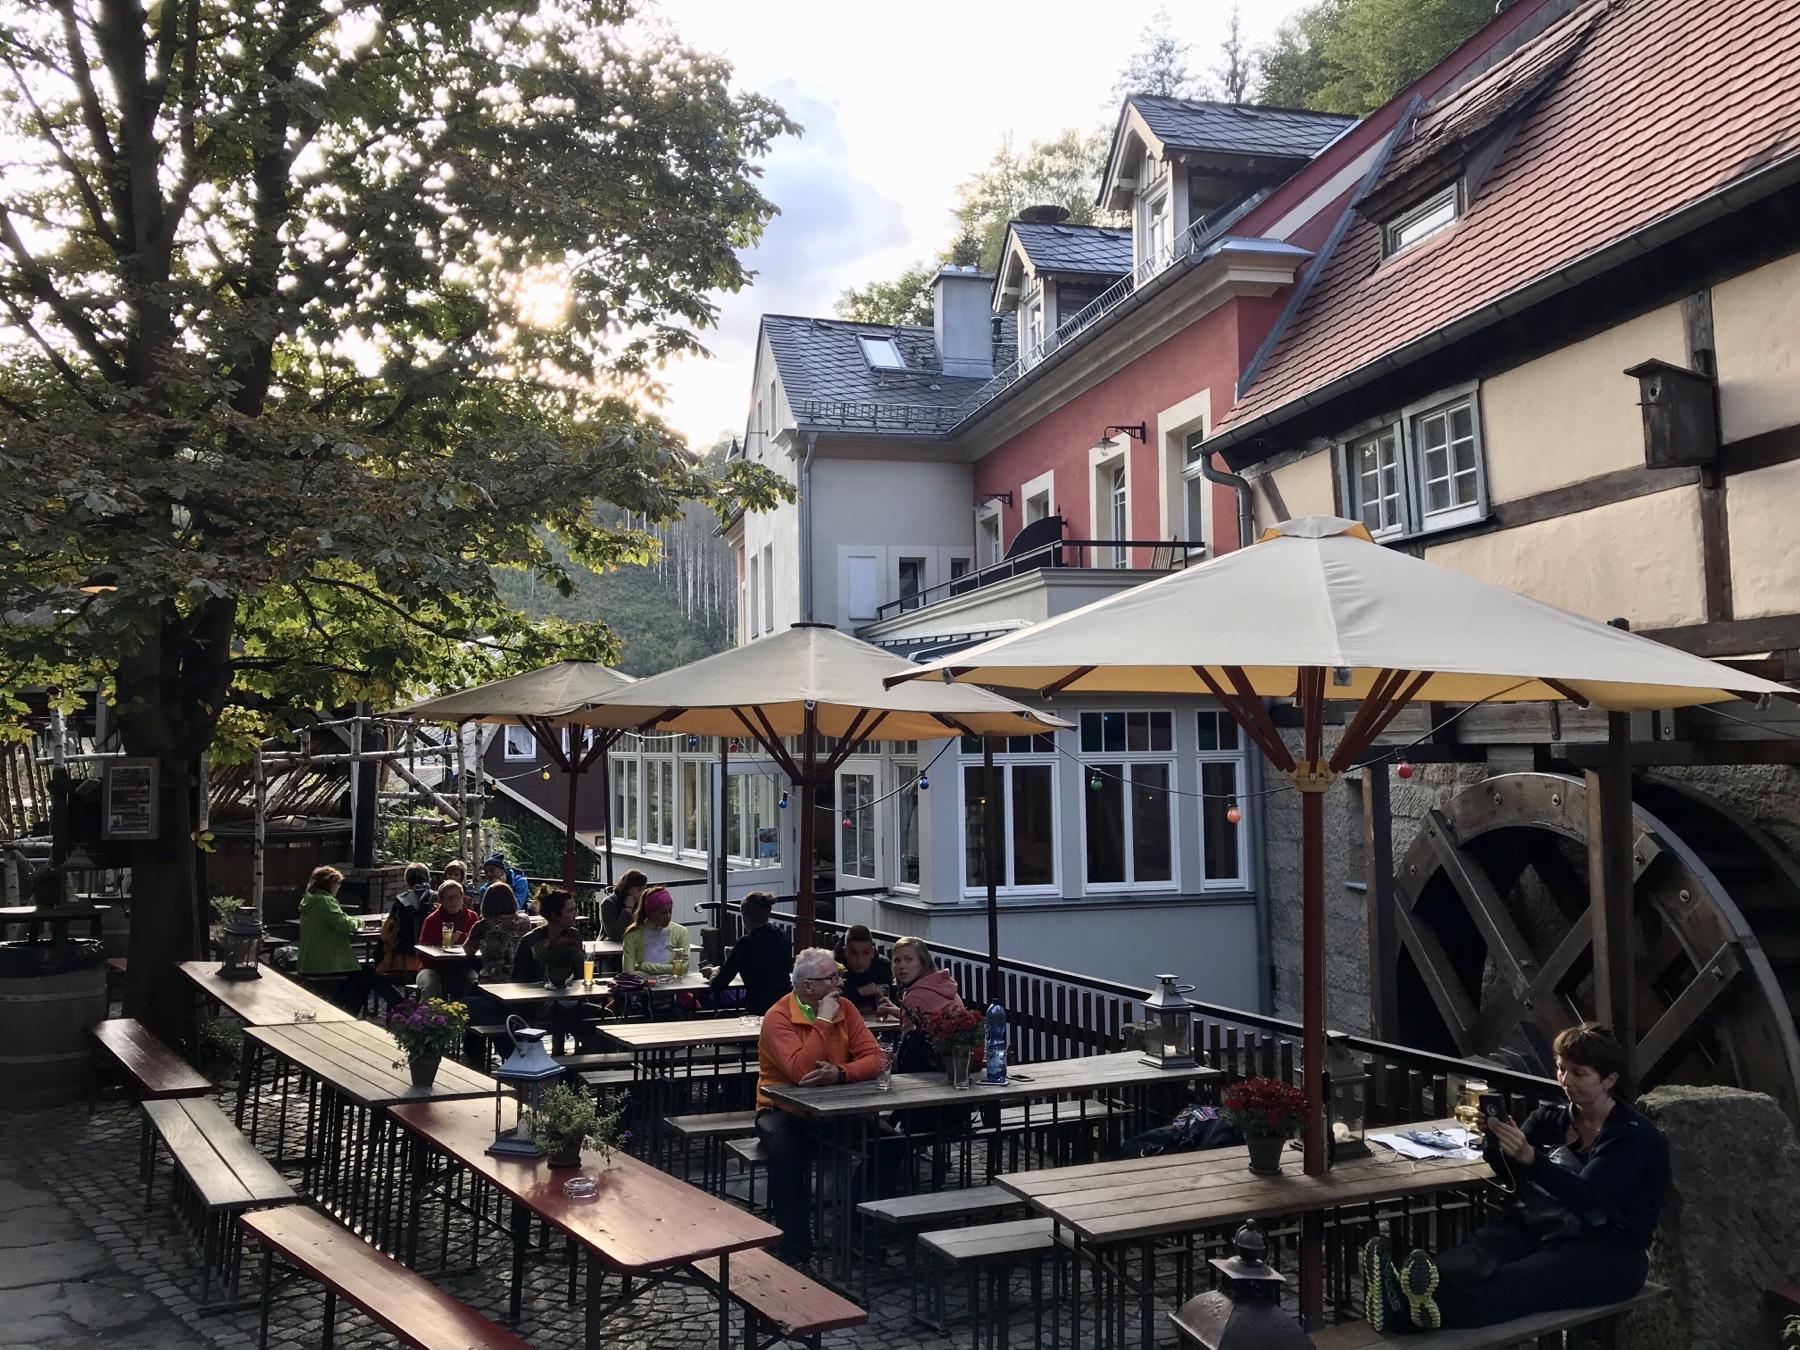 Biergarten Schmilk'sche Mühle Mahlerweg Etappe 5